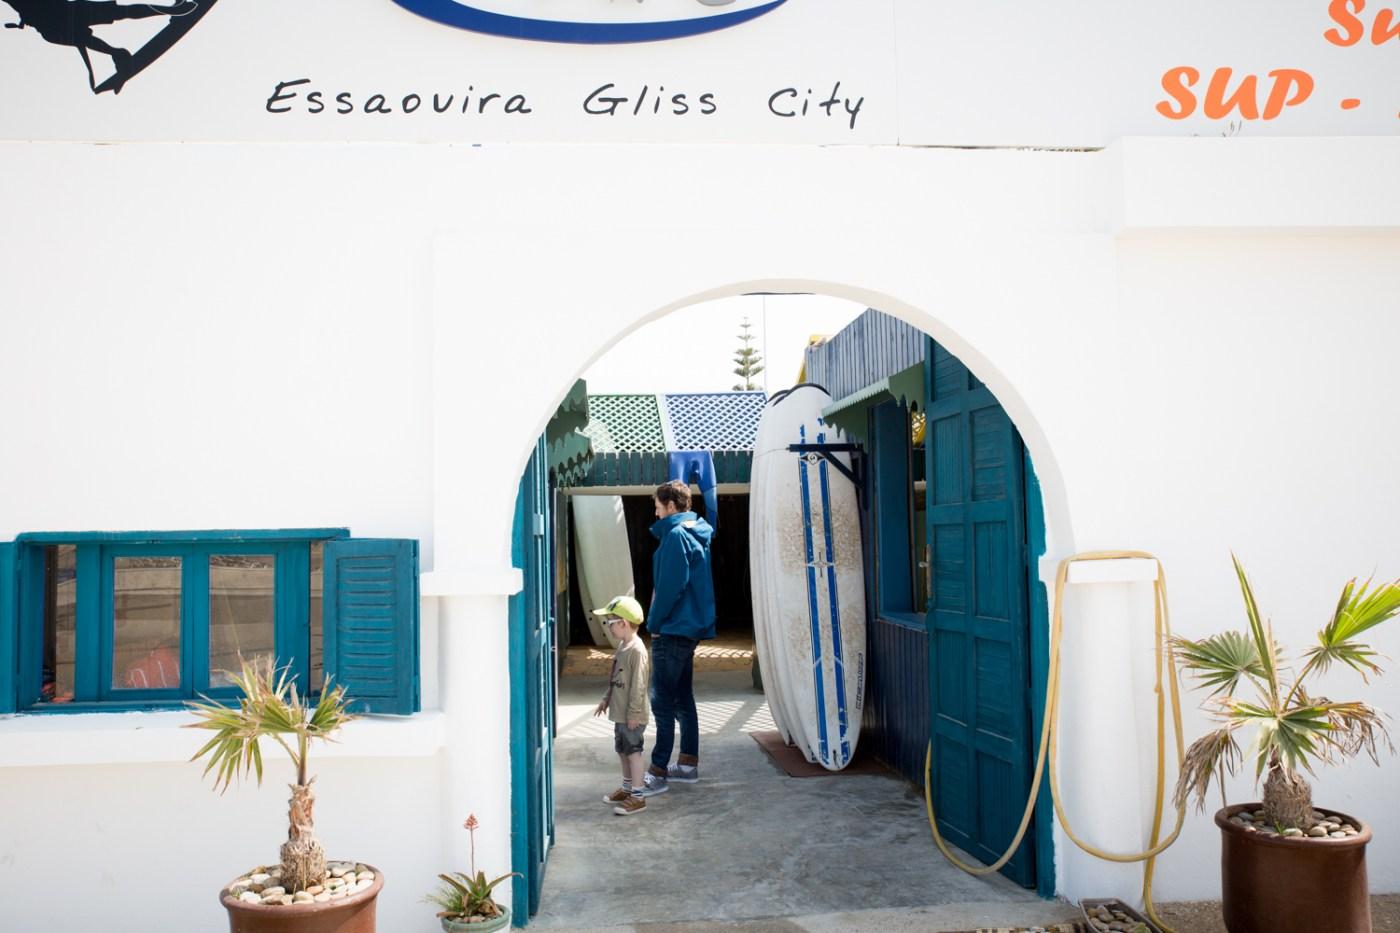 Essaouira gliss city